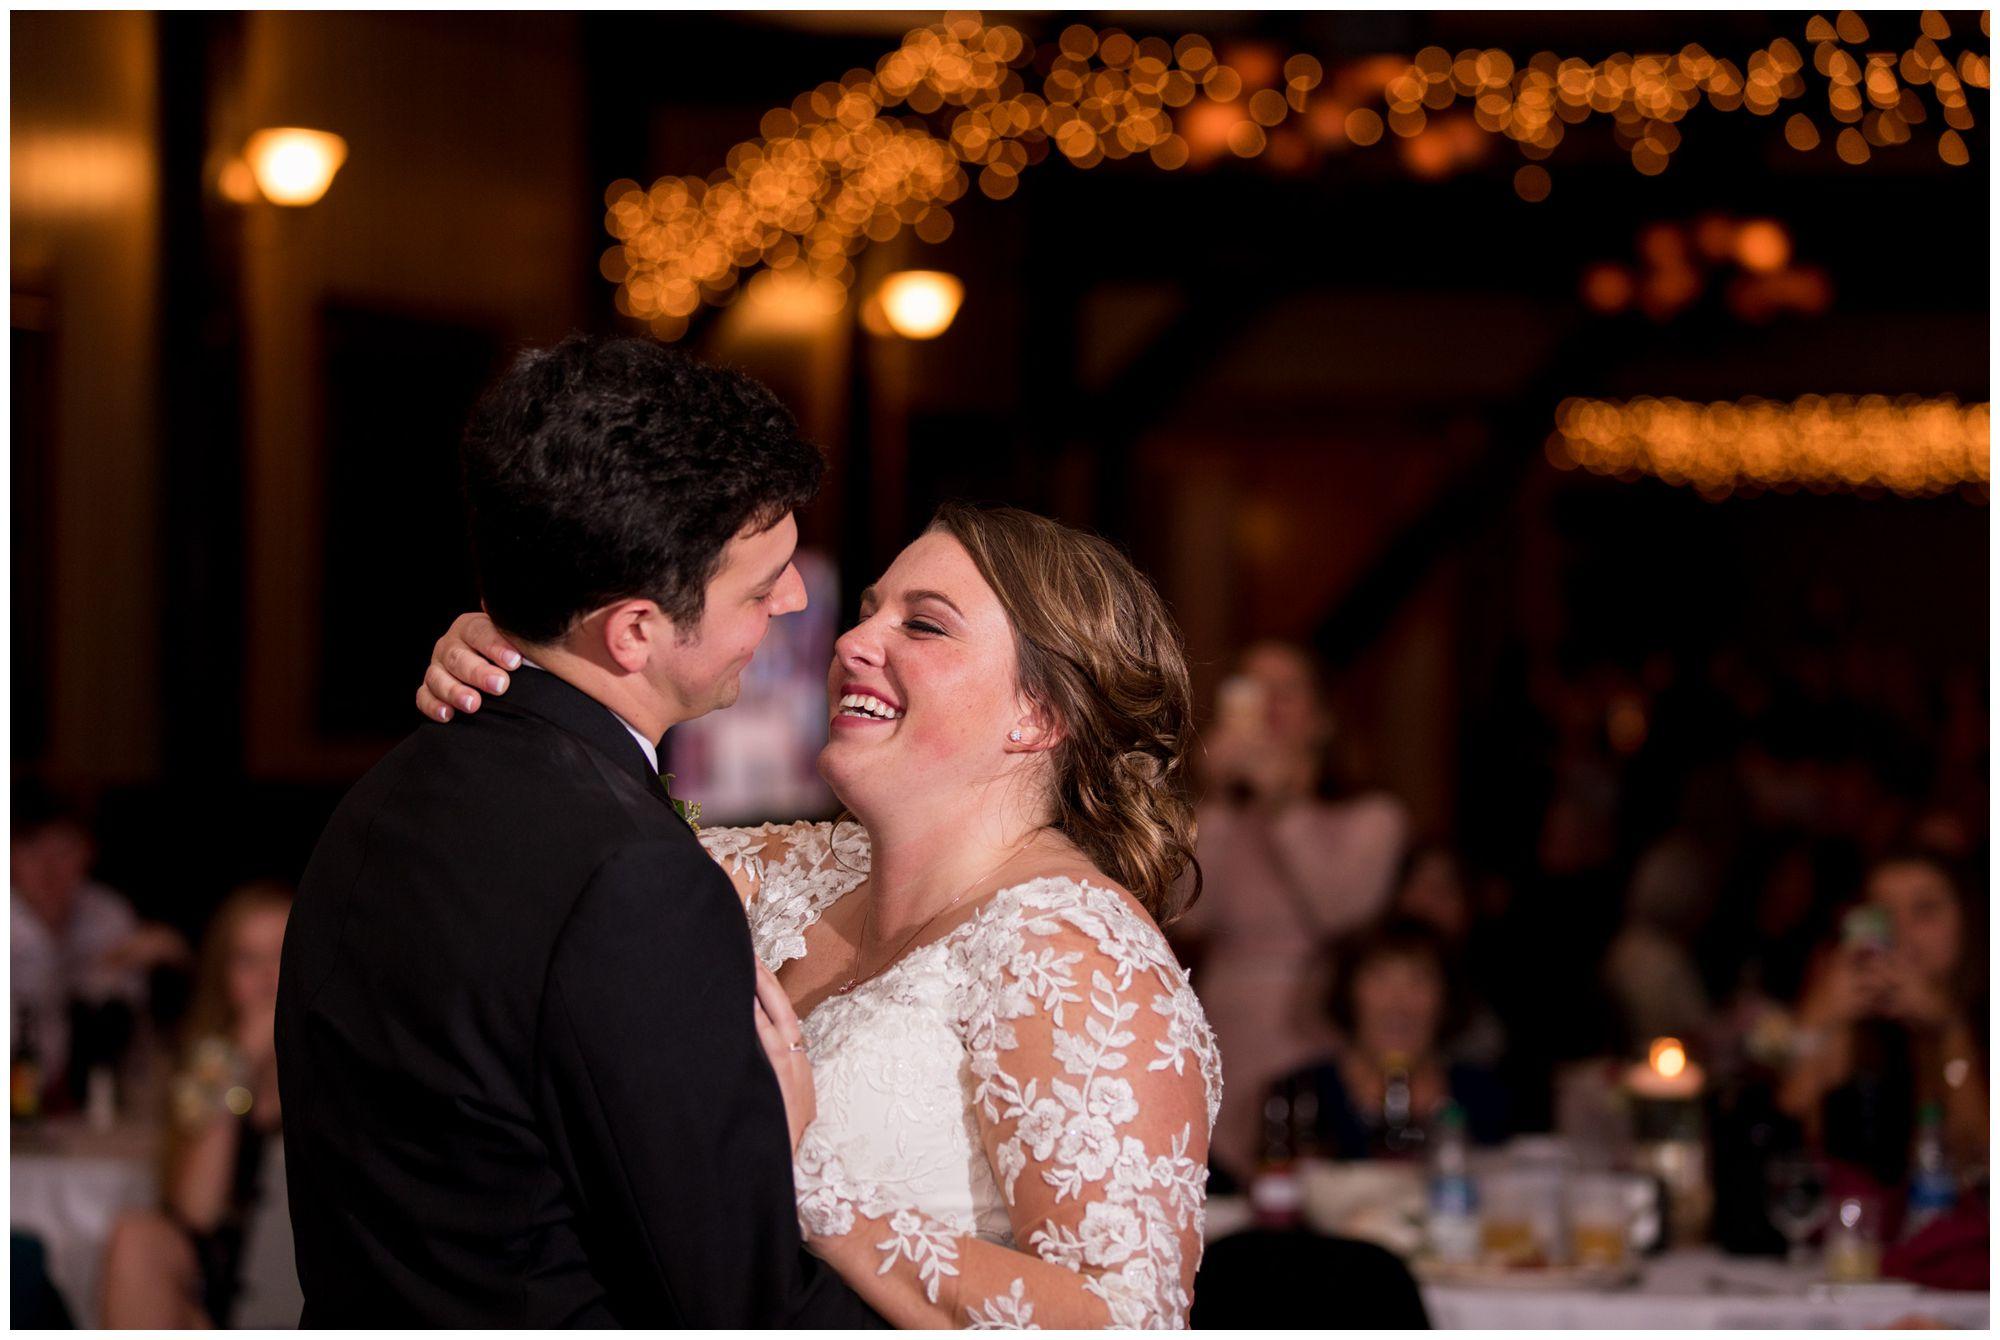 bride and groom first dance at Goeglein Homestead wedding reception in Fort Wayne